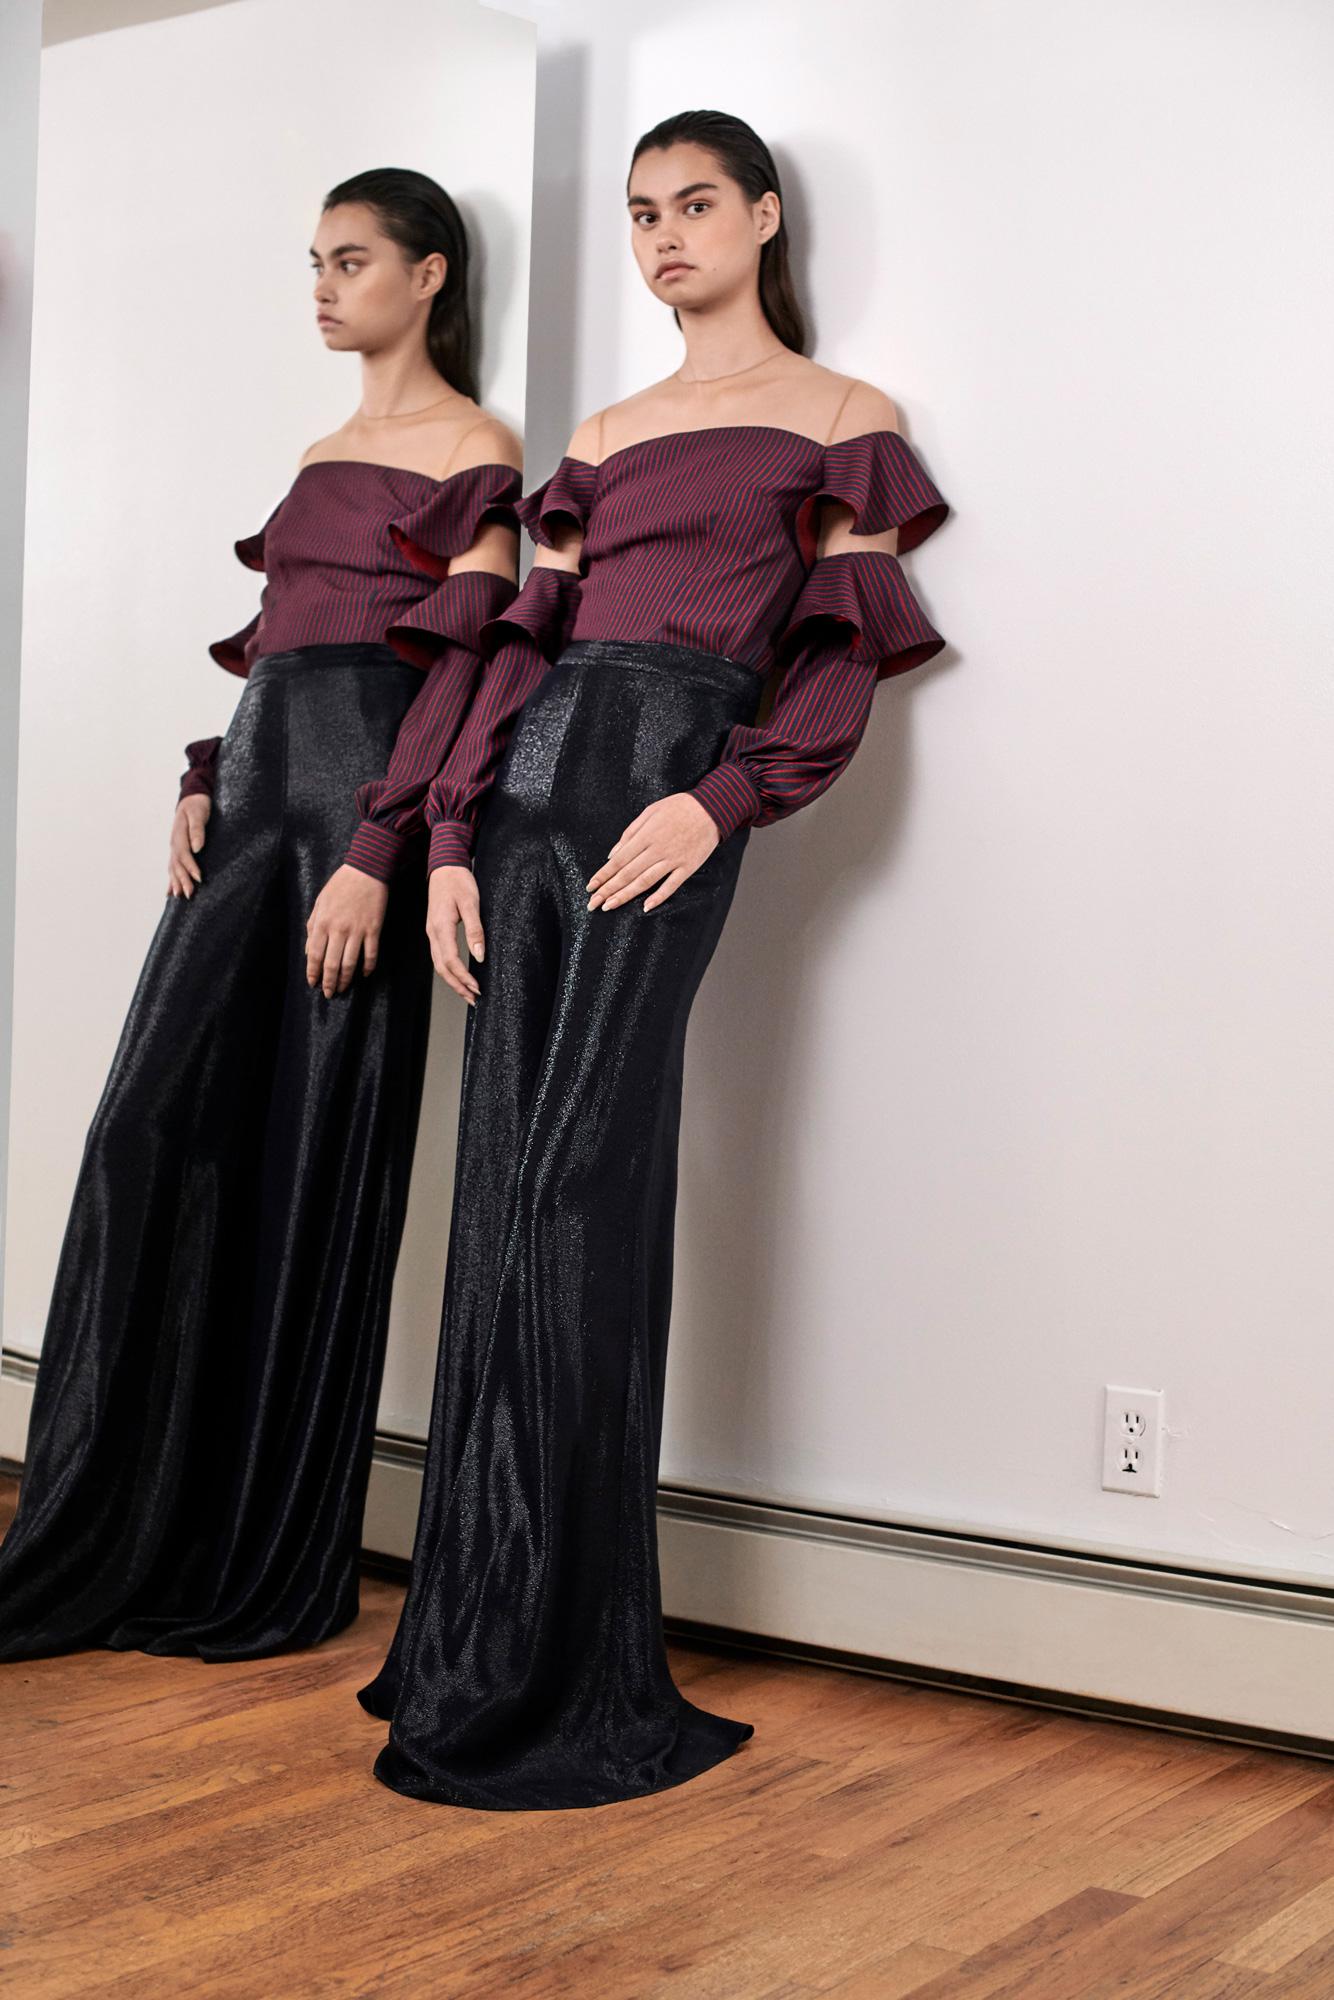 JULIANNA-BASS-PF19-10-The-Selena-Top-&-The-Stevie-Trouser-WEB.jpg